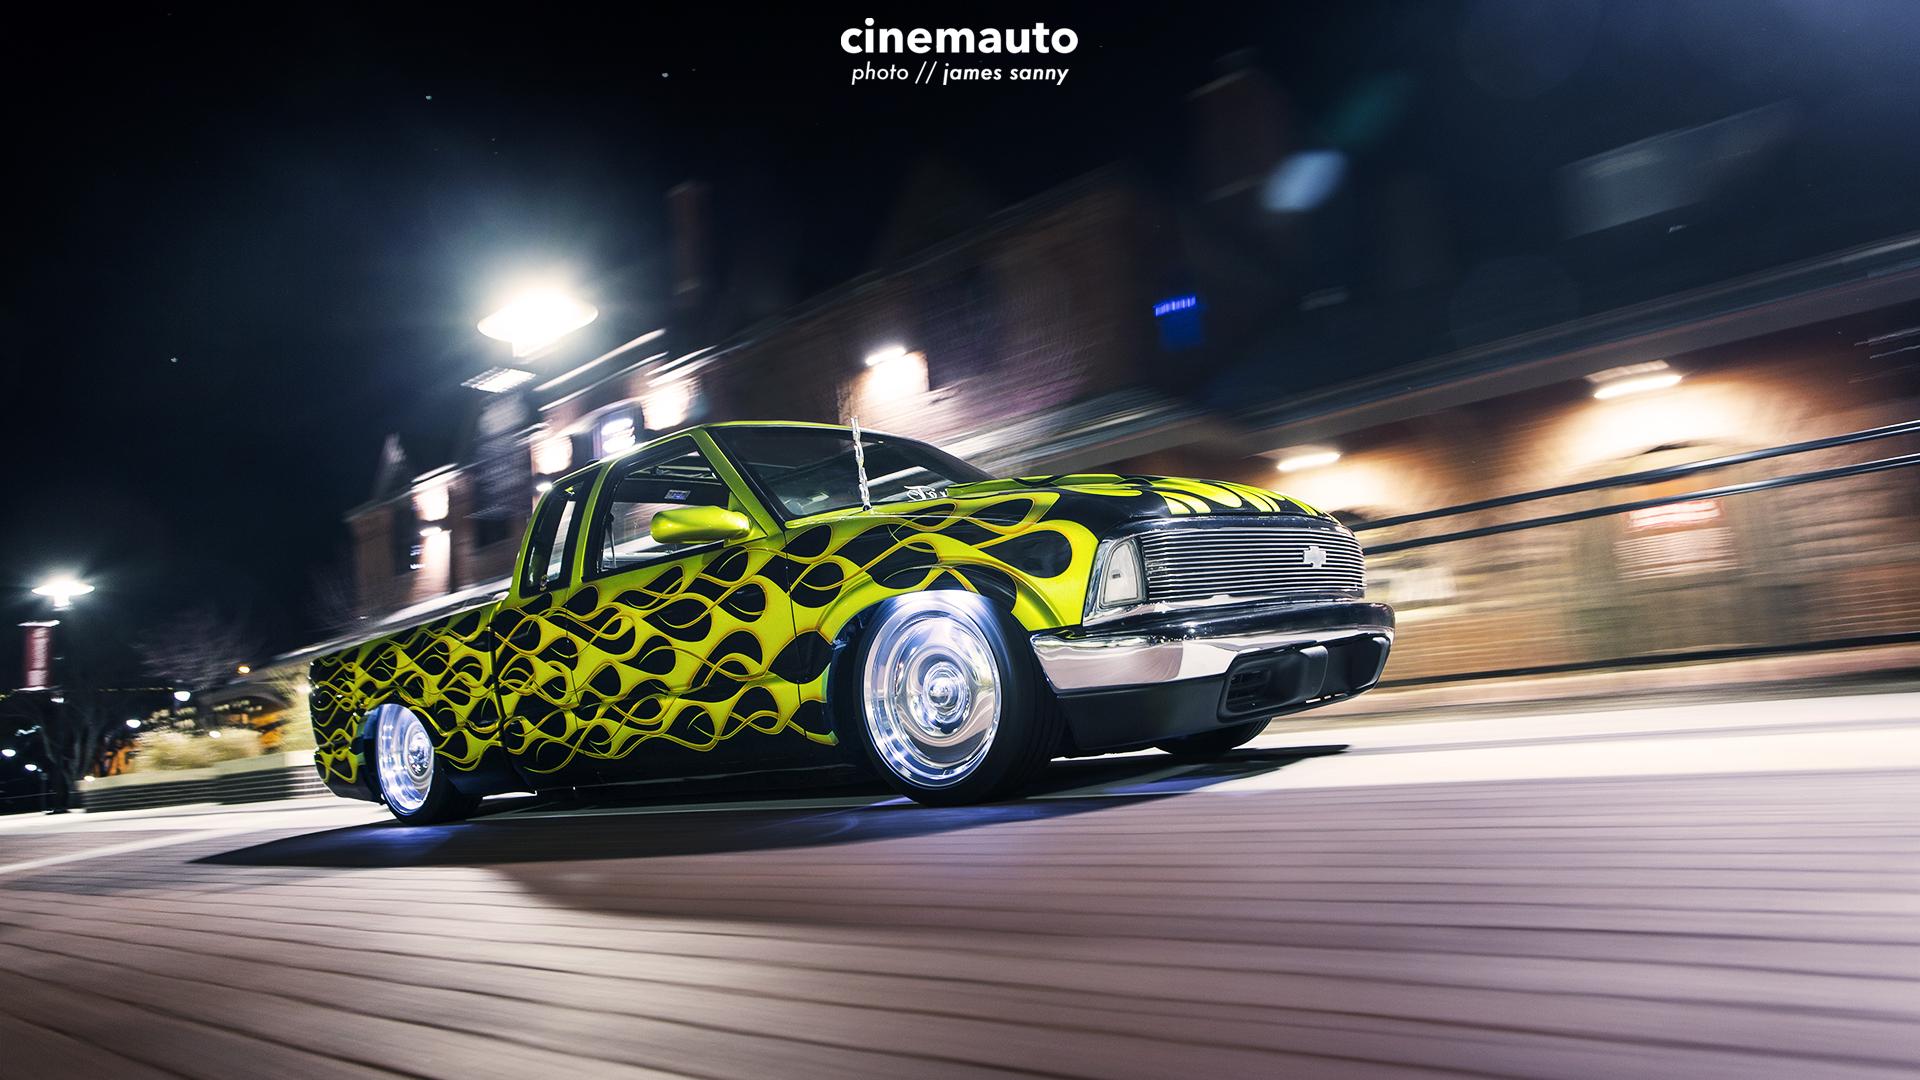 cinemauto-wichita-automotive-photographer-james-sanny-Zsm.jpg